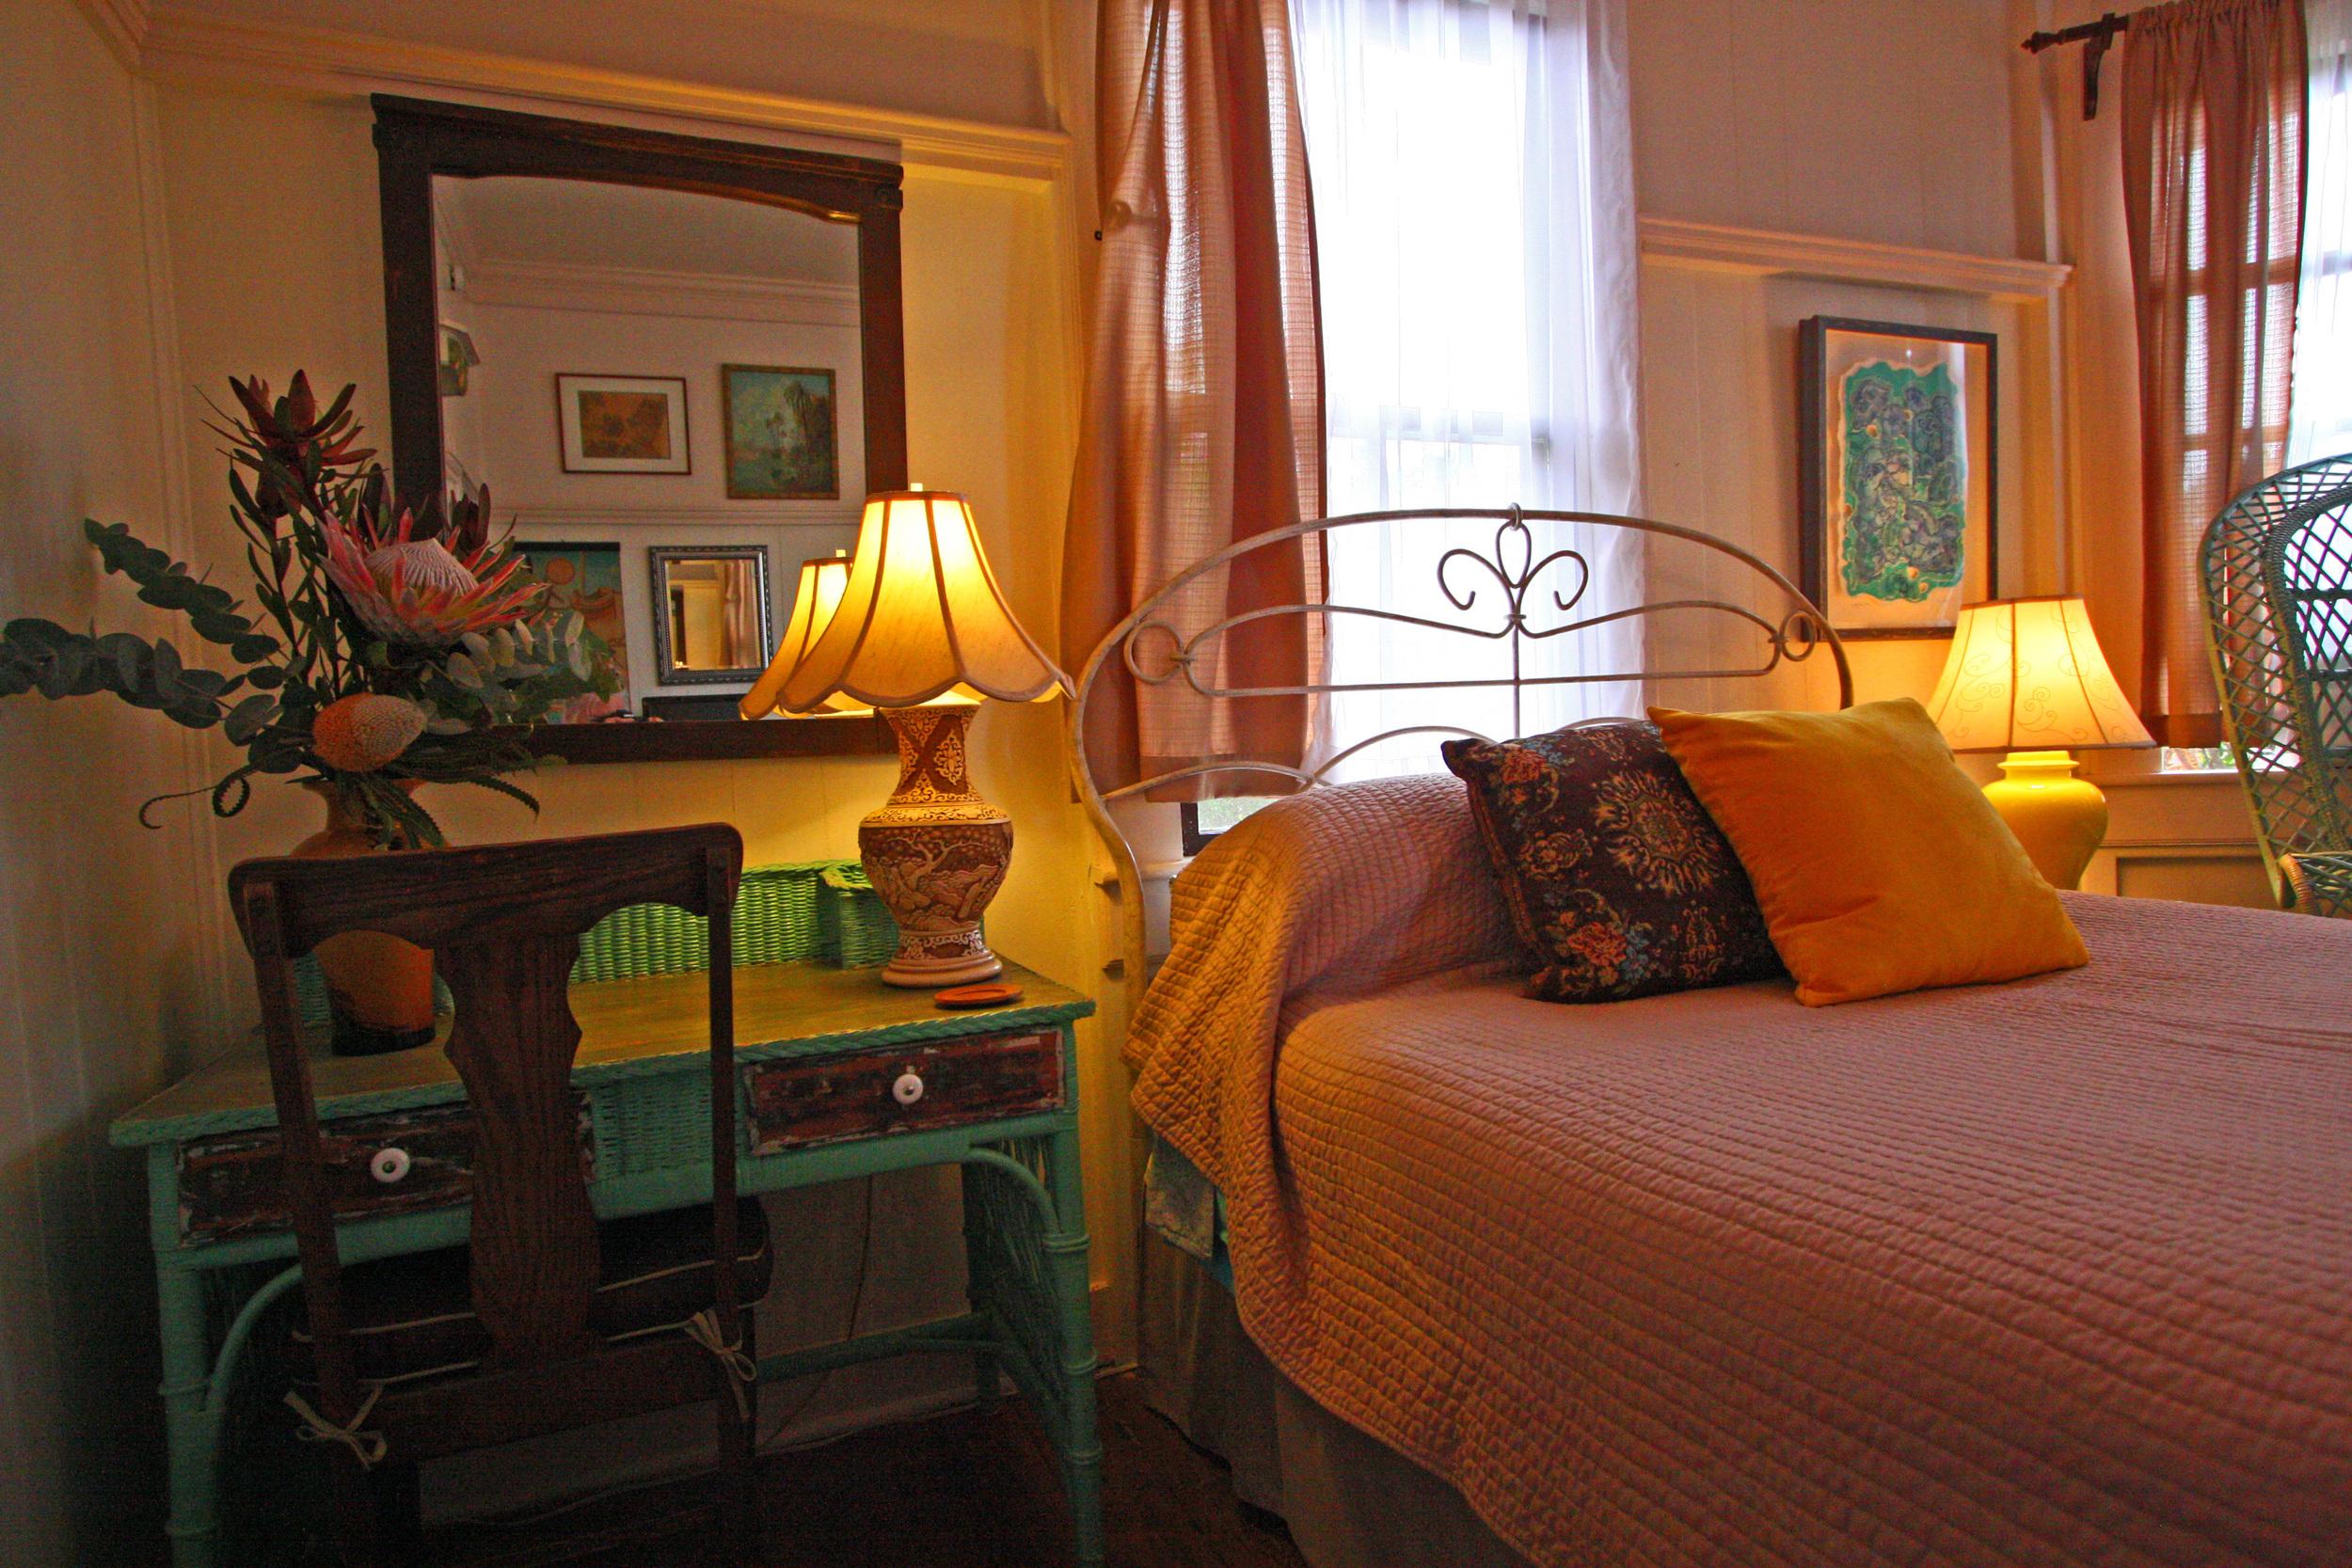 The main bedroom of the kona wing at the Hale Hookipa Inn